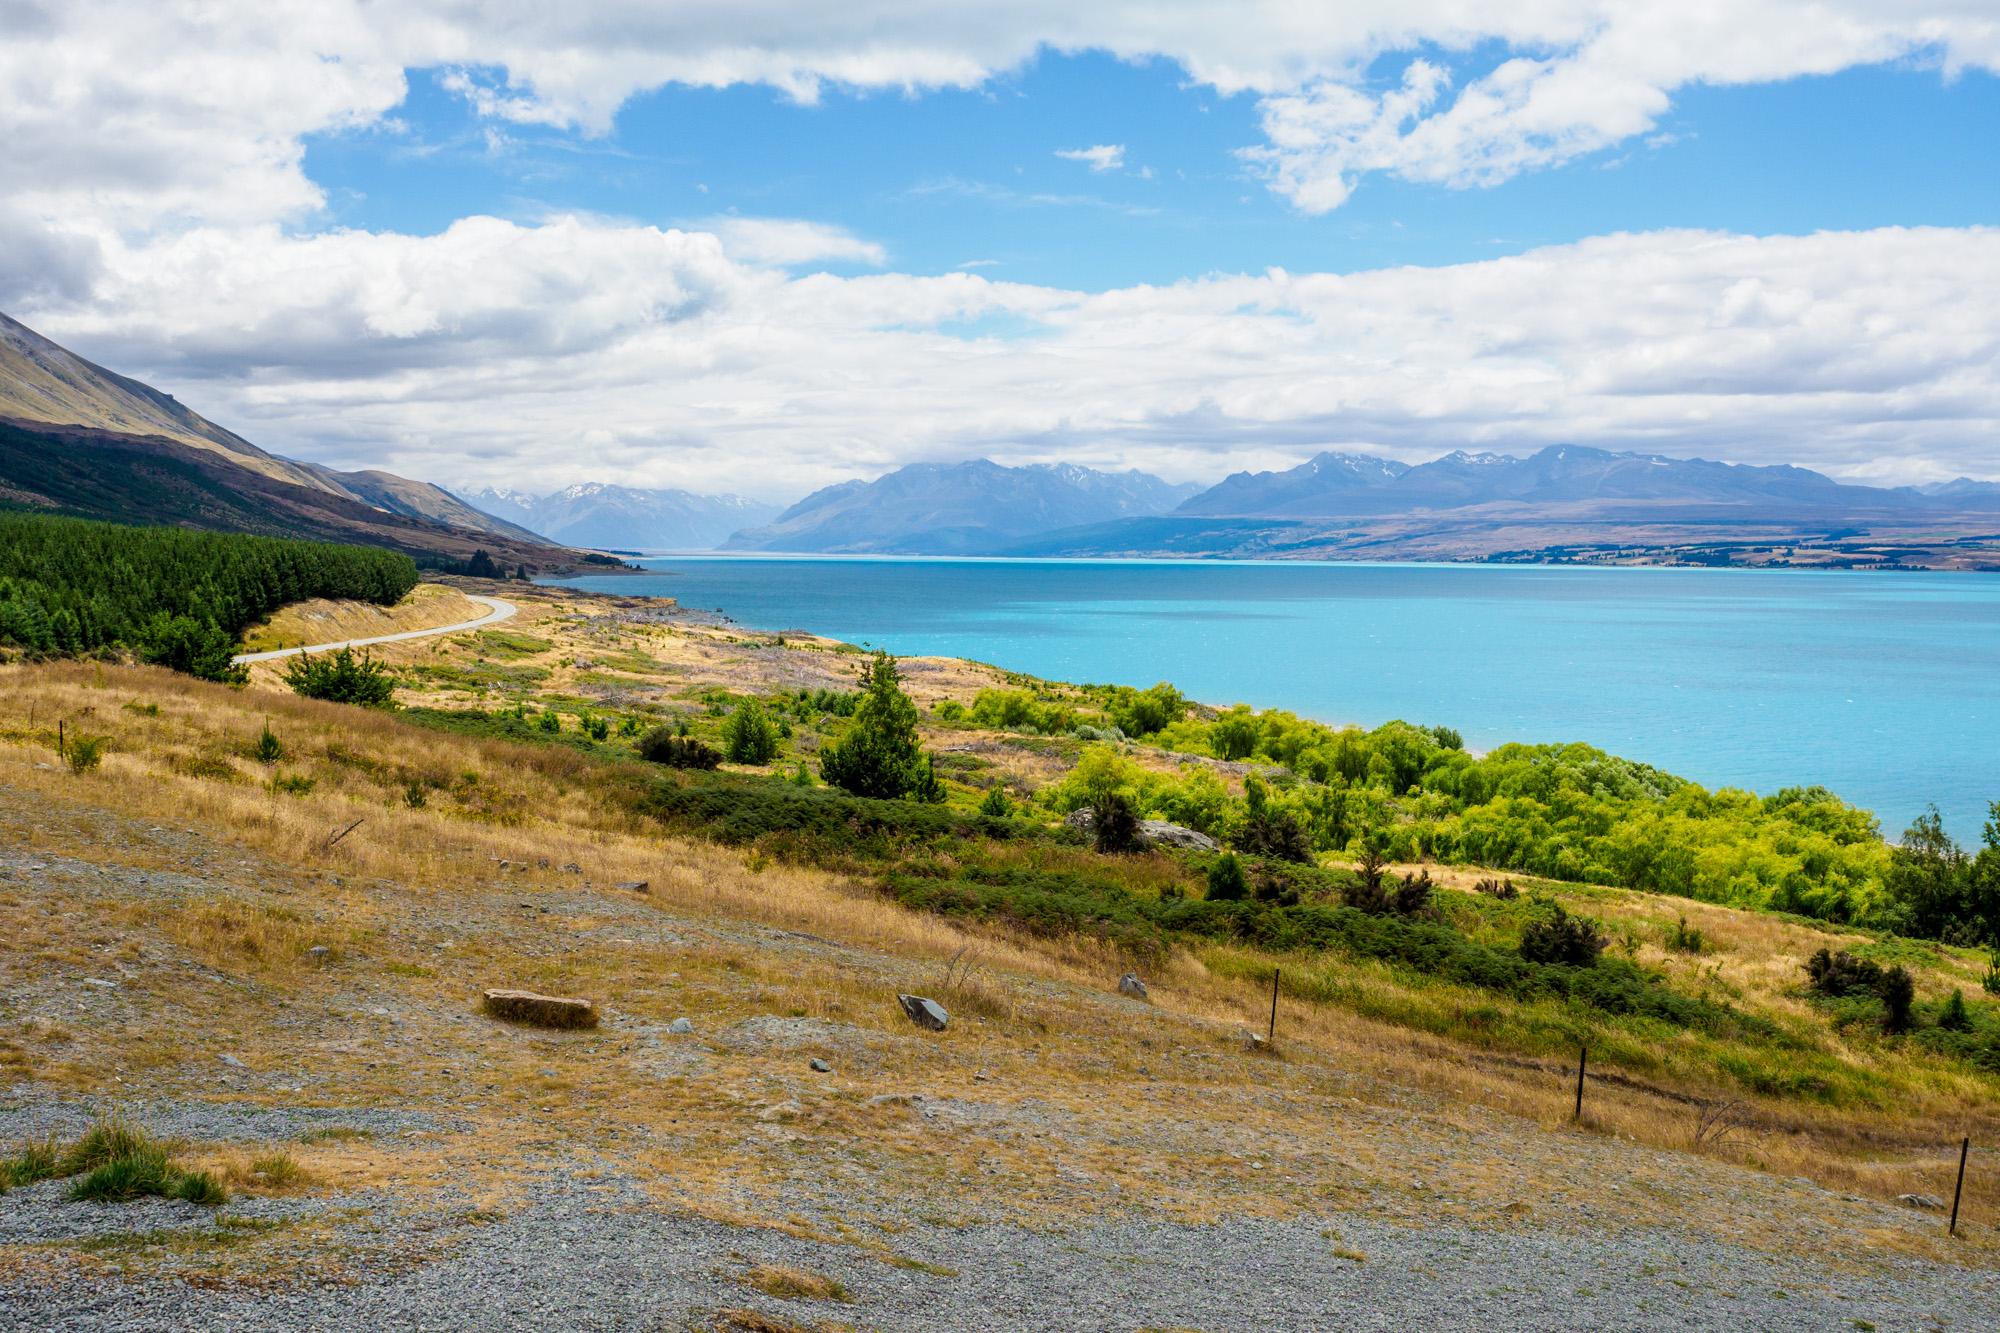 Aoraki Mt Cook Nationalpark - Lake Pukaki